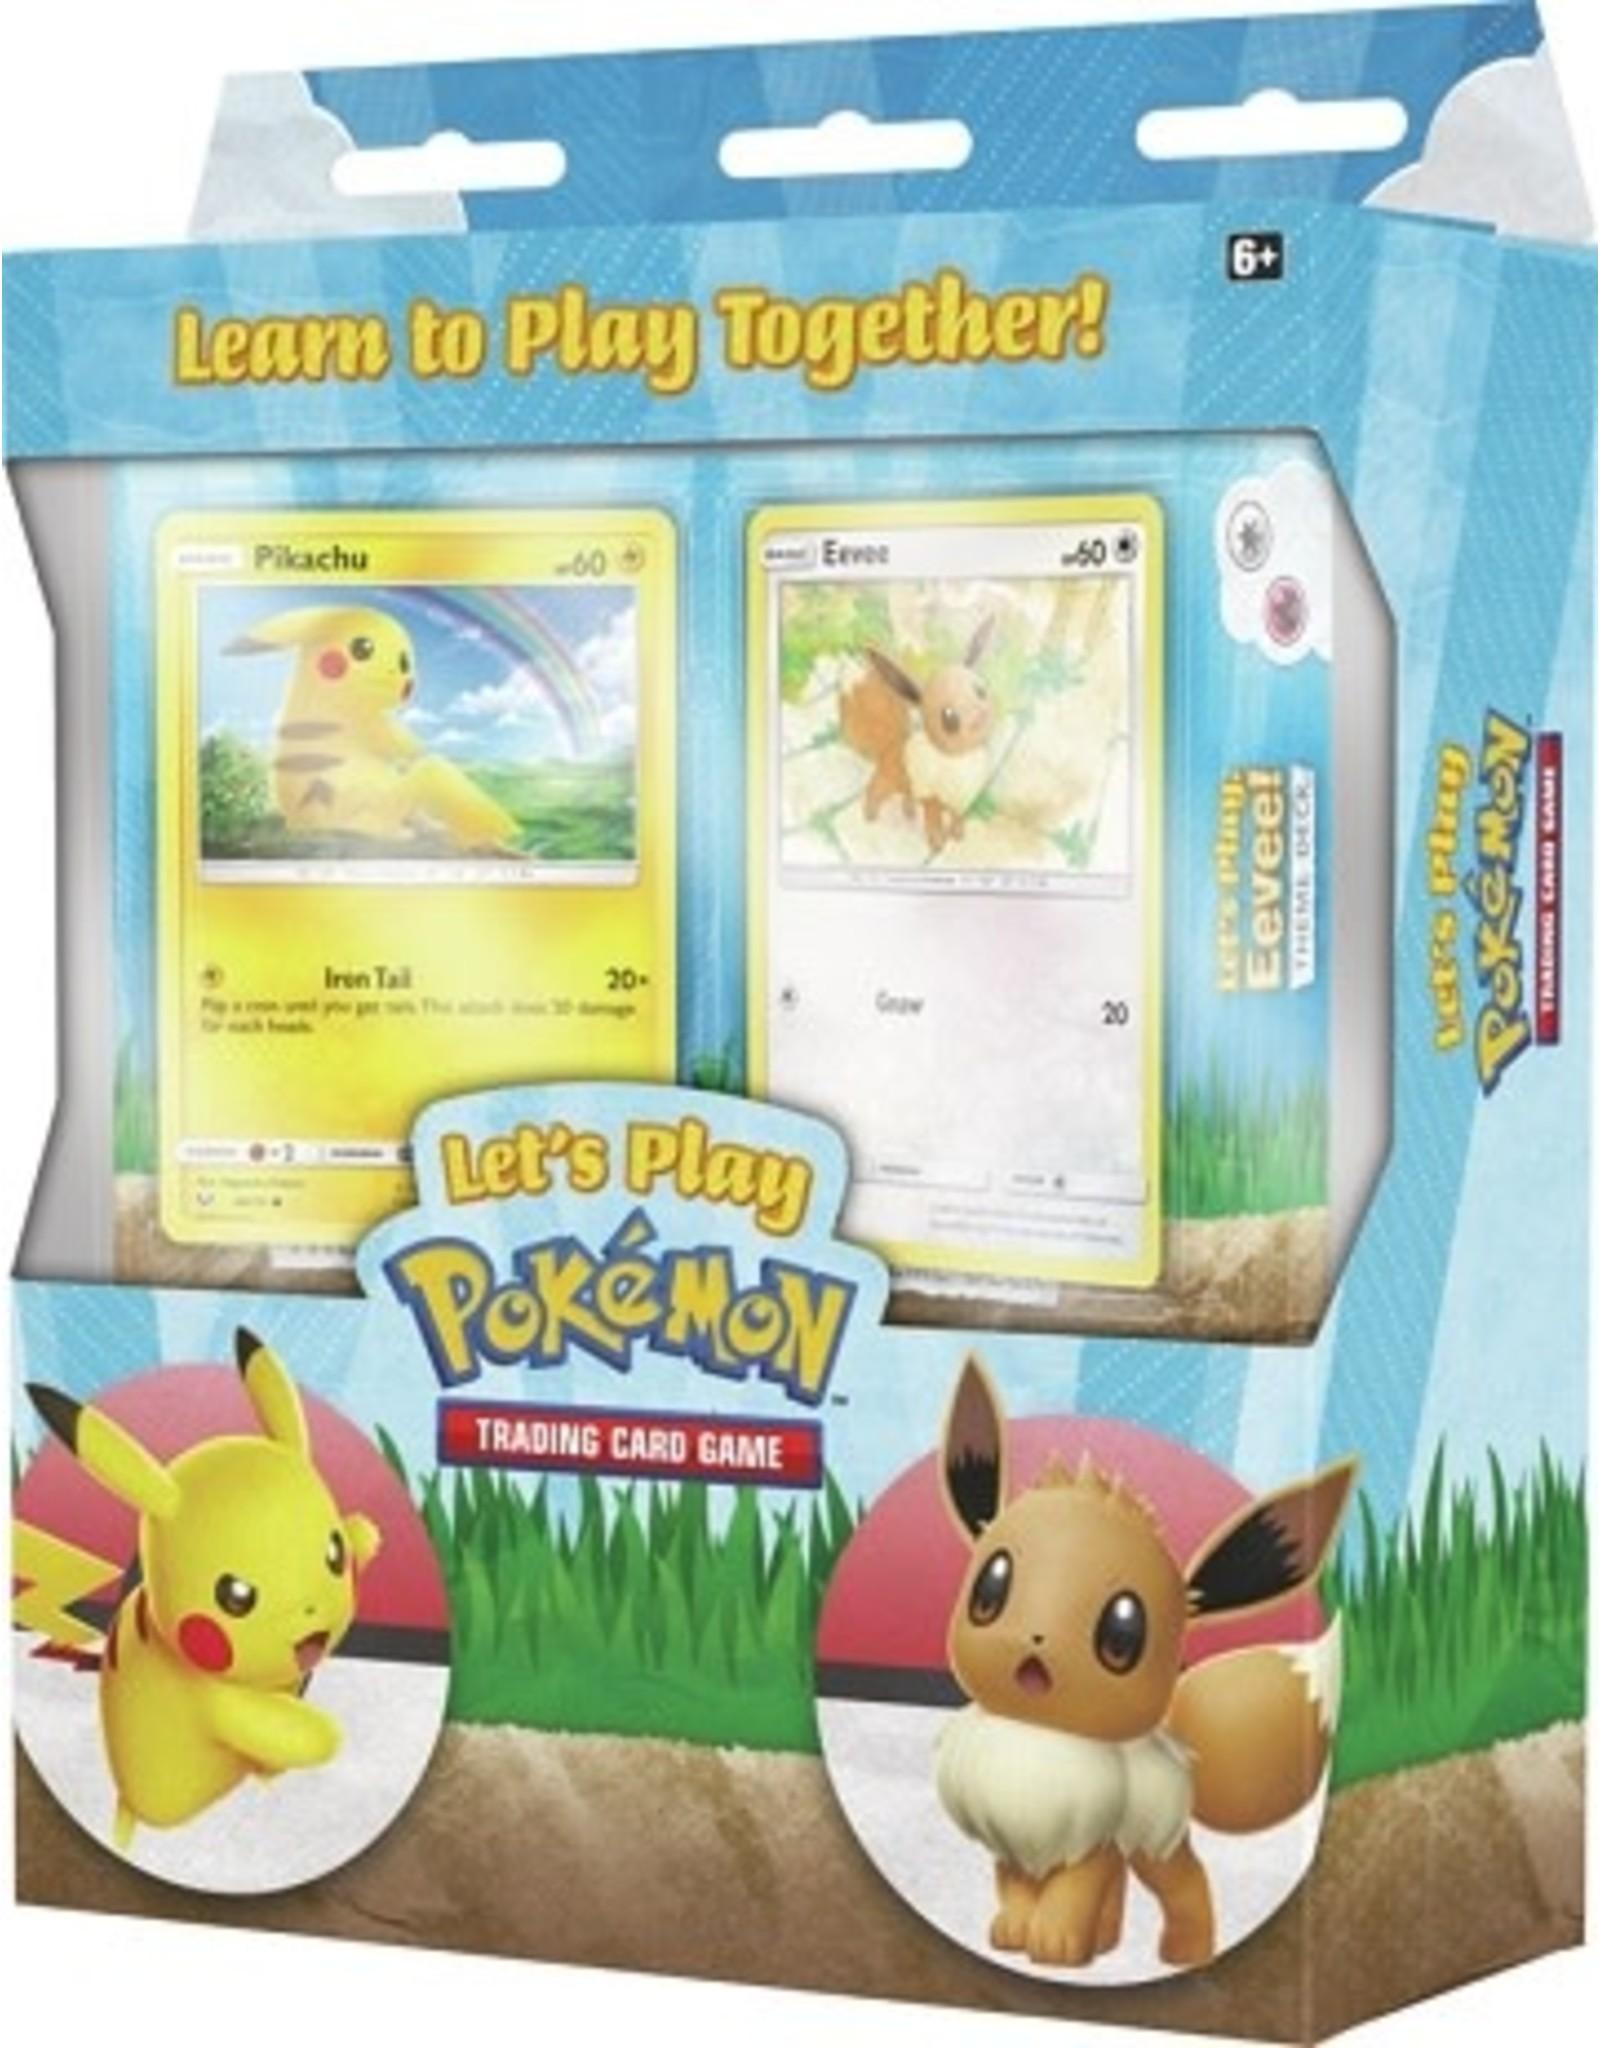 Pokemon Let's Play Pokemon Pikachu and Eevee